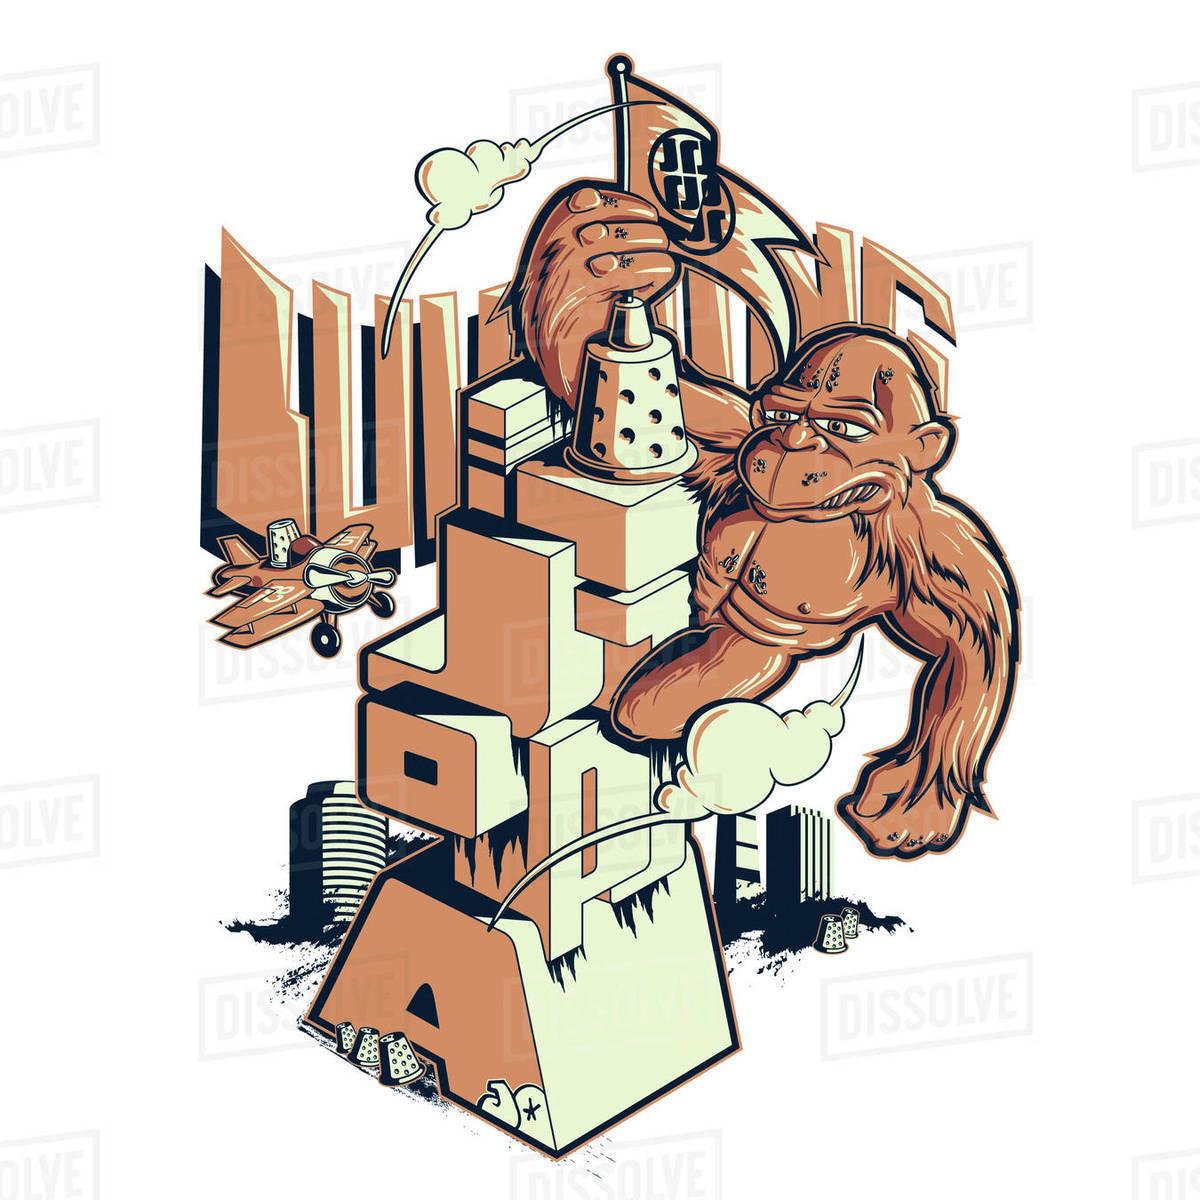 Cartoon illustration of ape on Jotopia structure Royalty-free stock photo